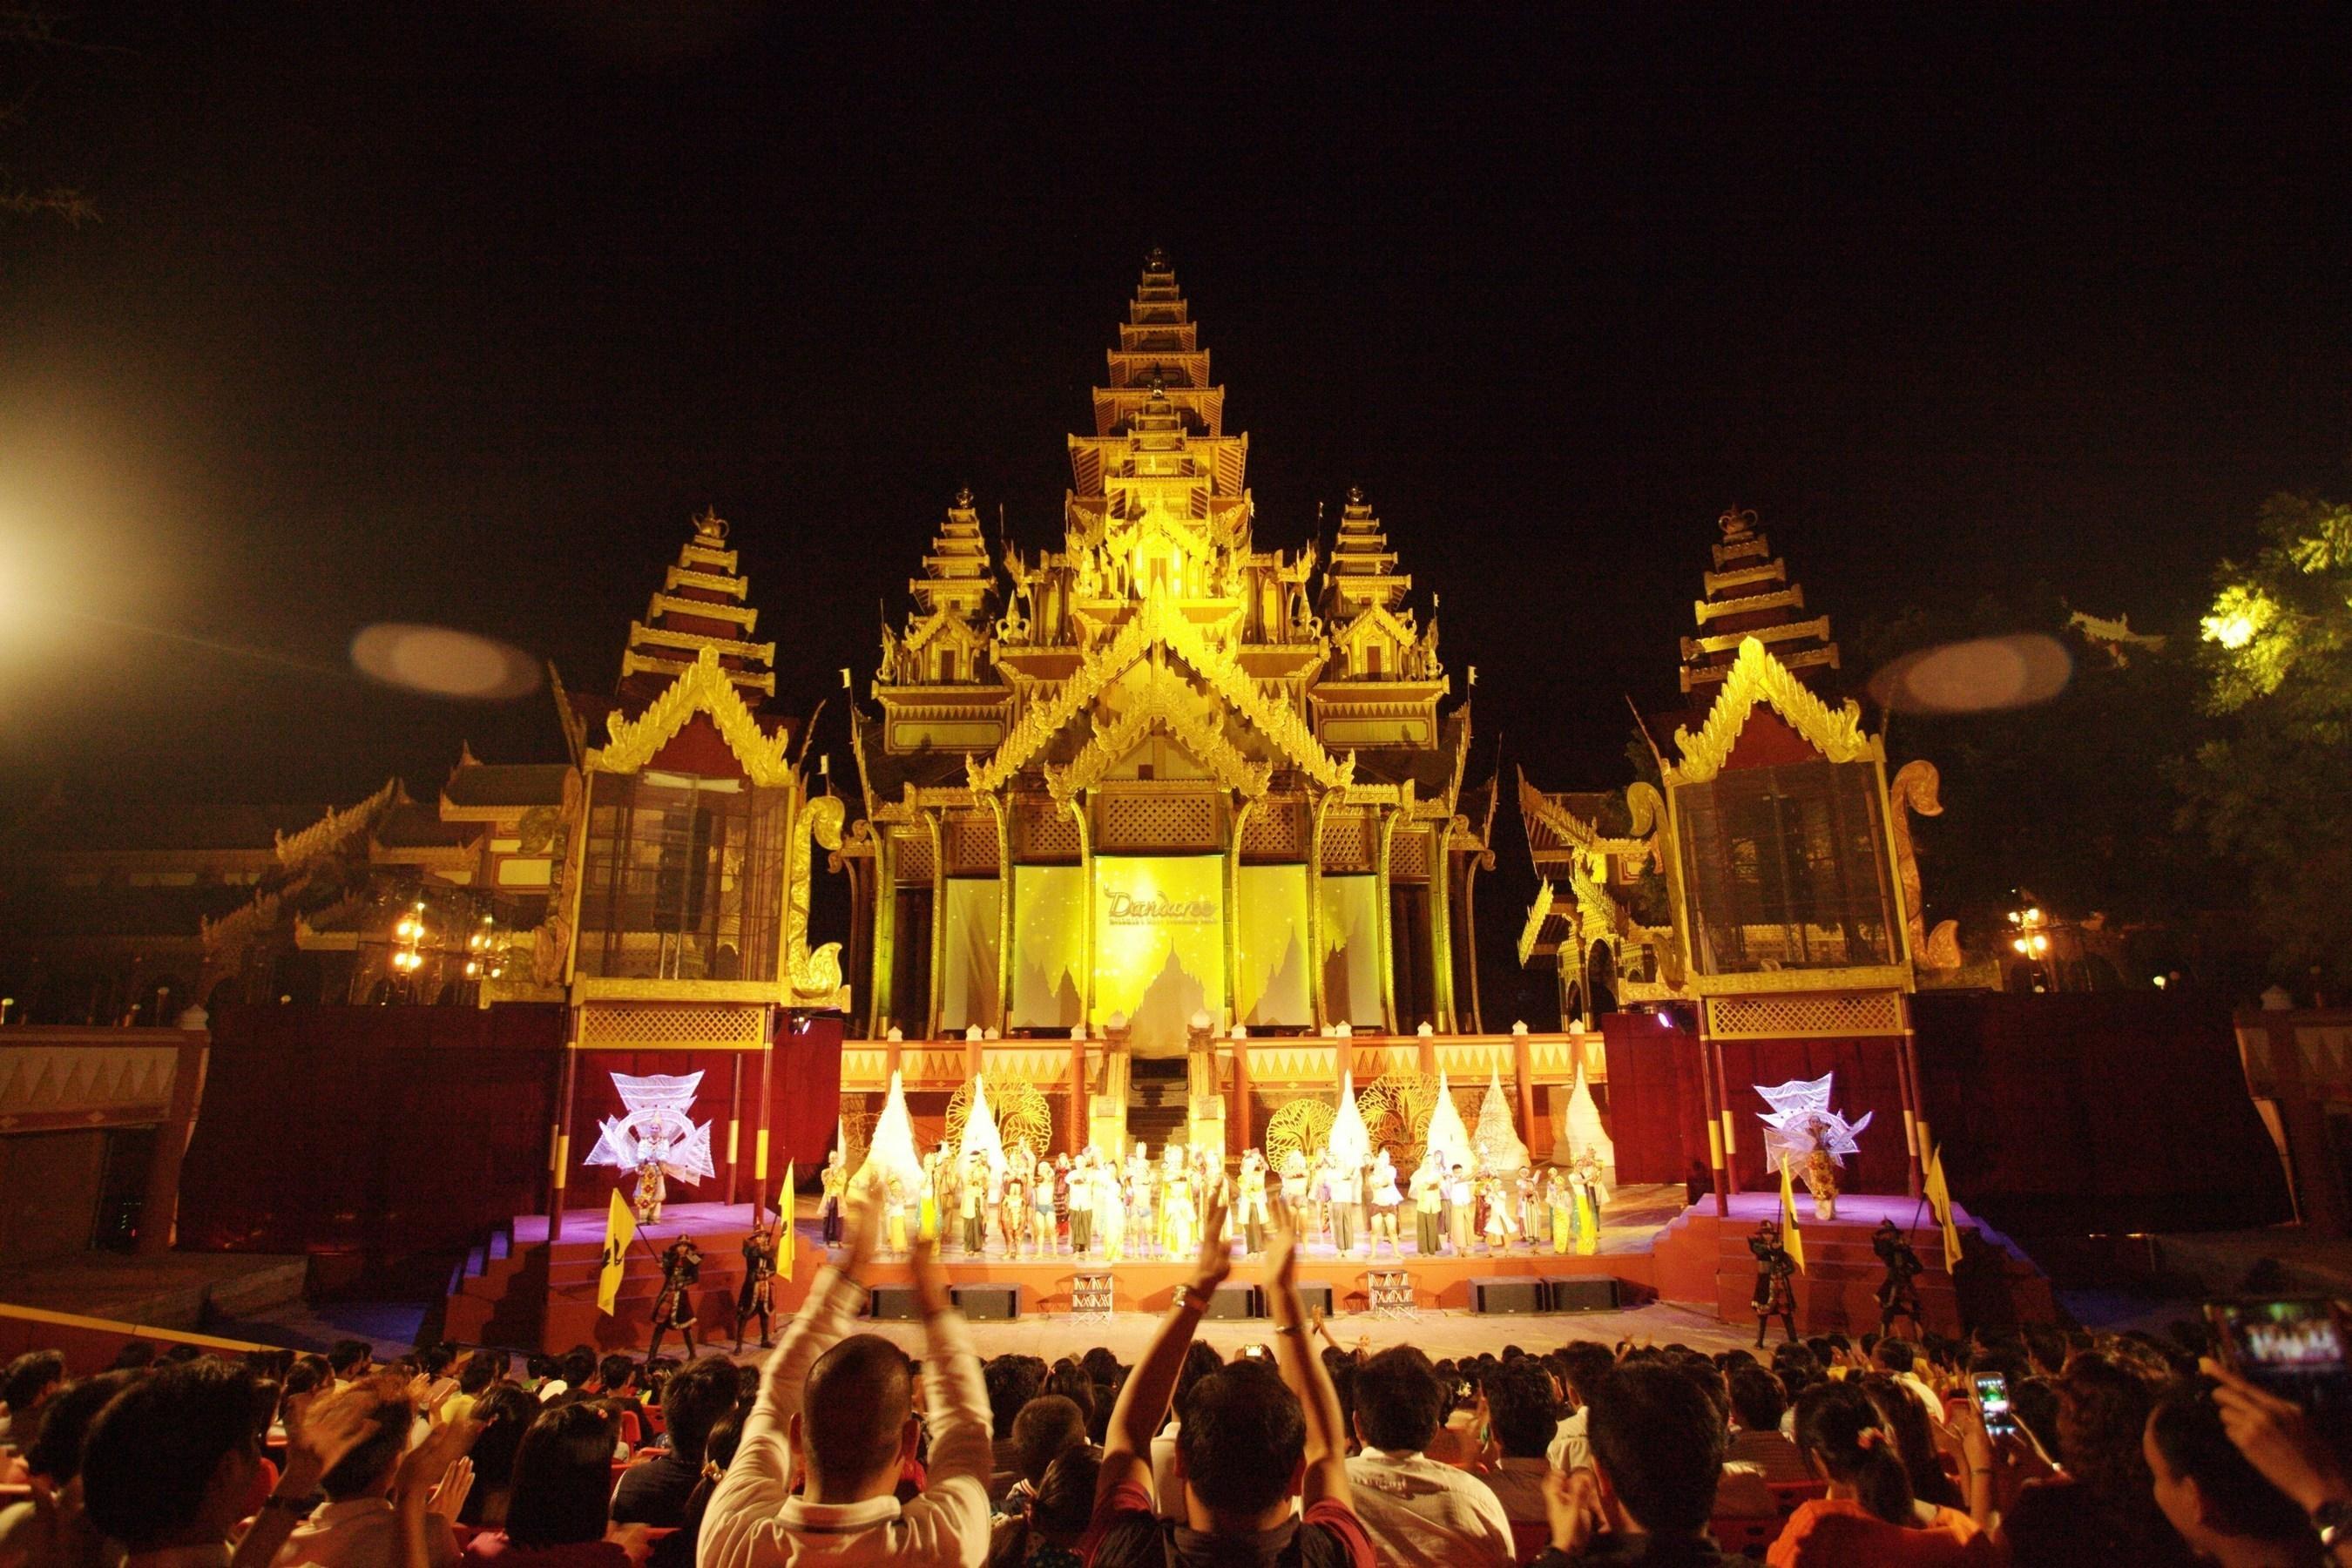 Lanciato 'Dandaree' a Bagan per incrementare il turismo a Myanmar